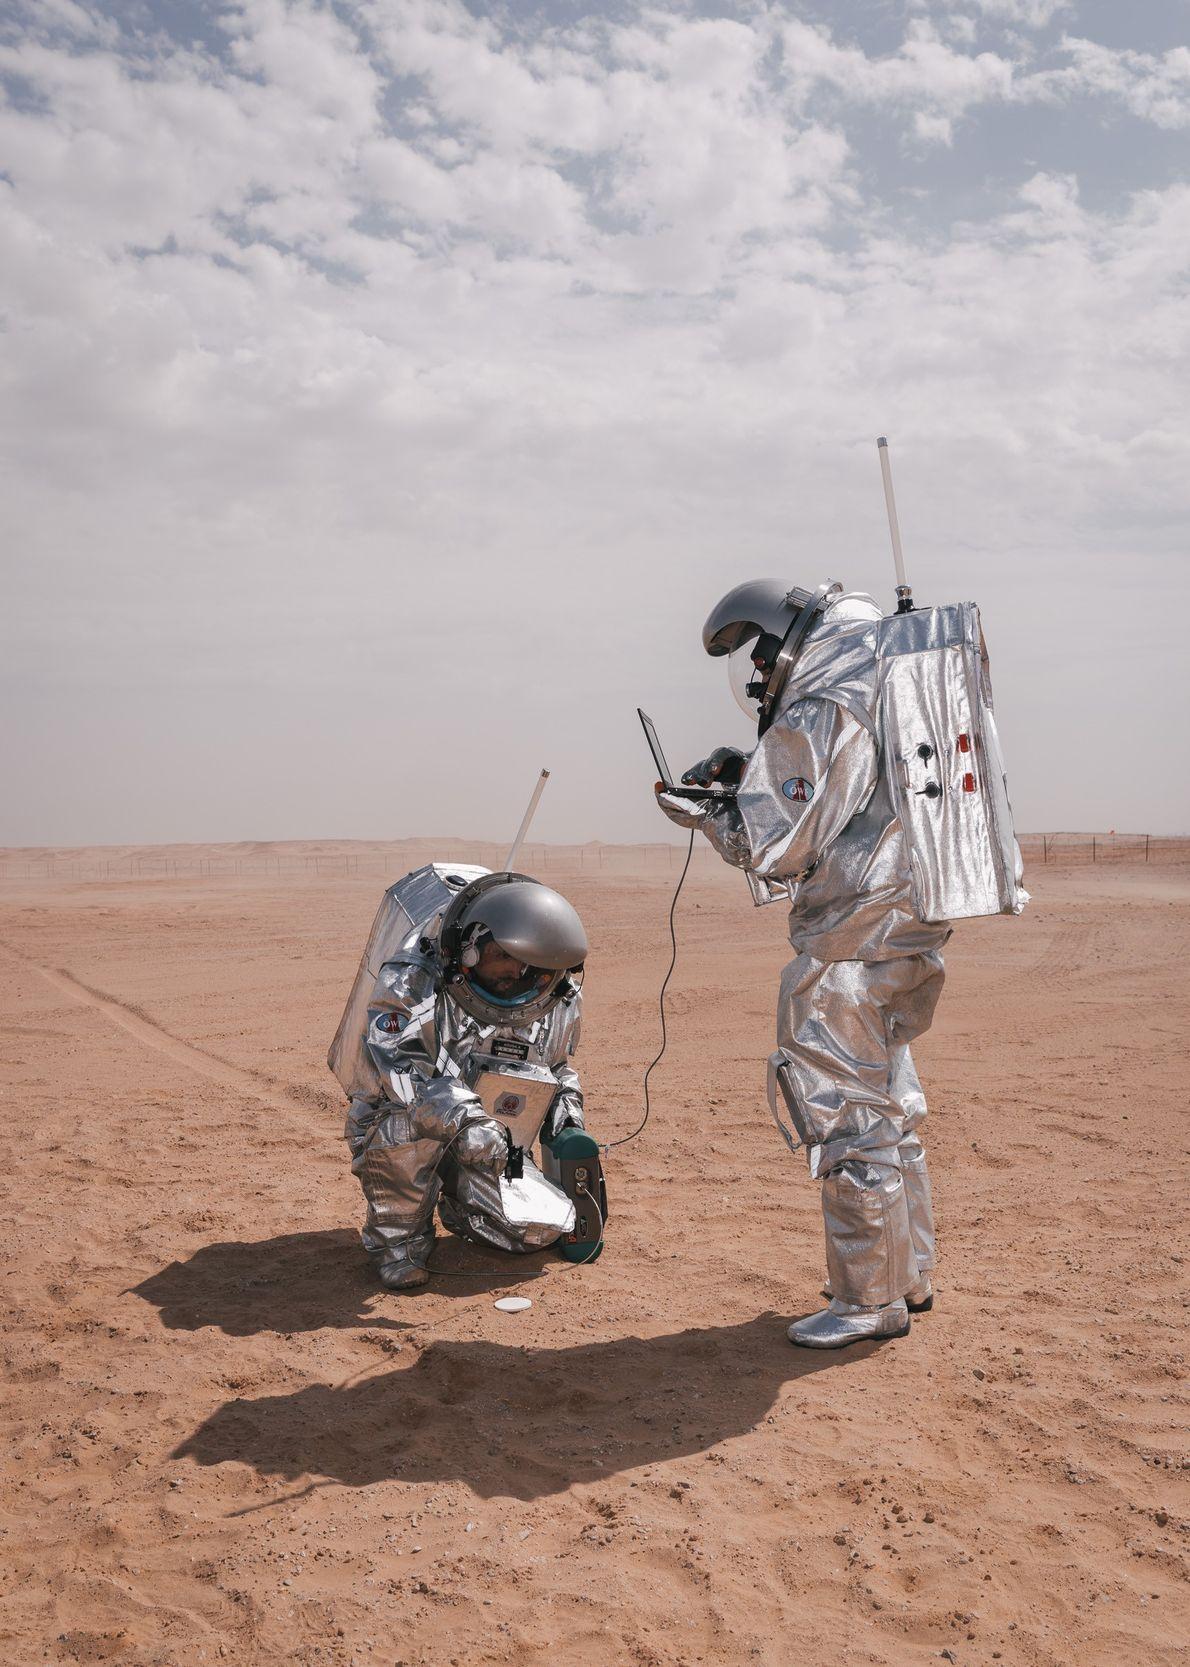 Analog astronauts Carmen Köhler and Iñigo Muñoz Elorza conduct an Italian Space Agency experiment to test ...